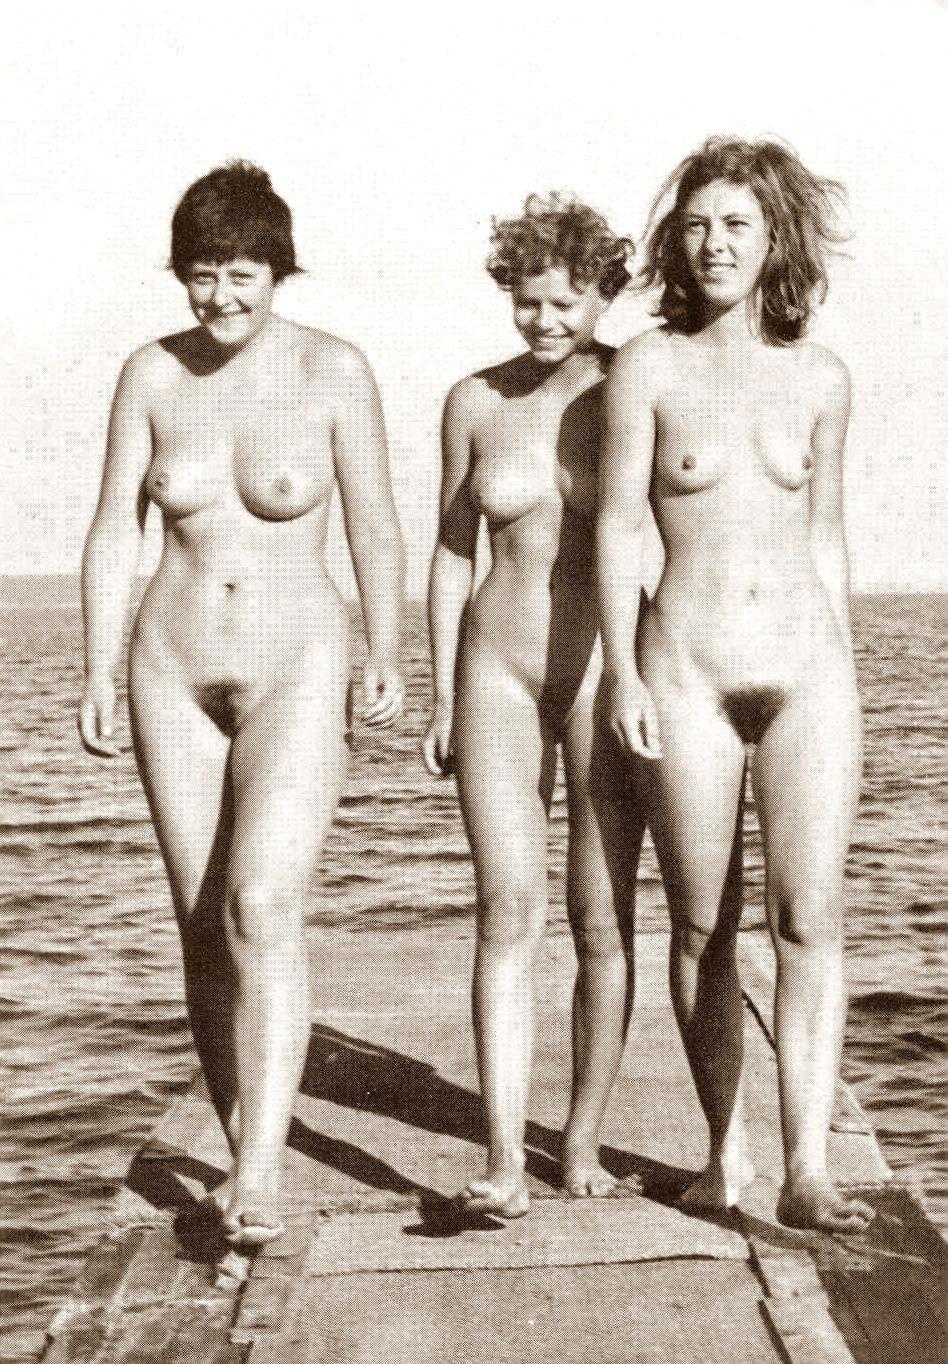 single fkk reisen porno am beach